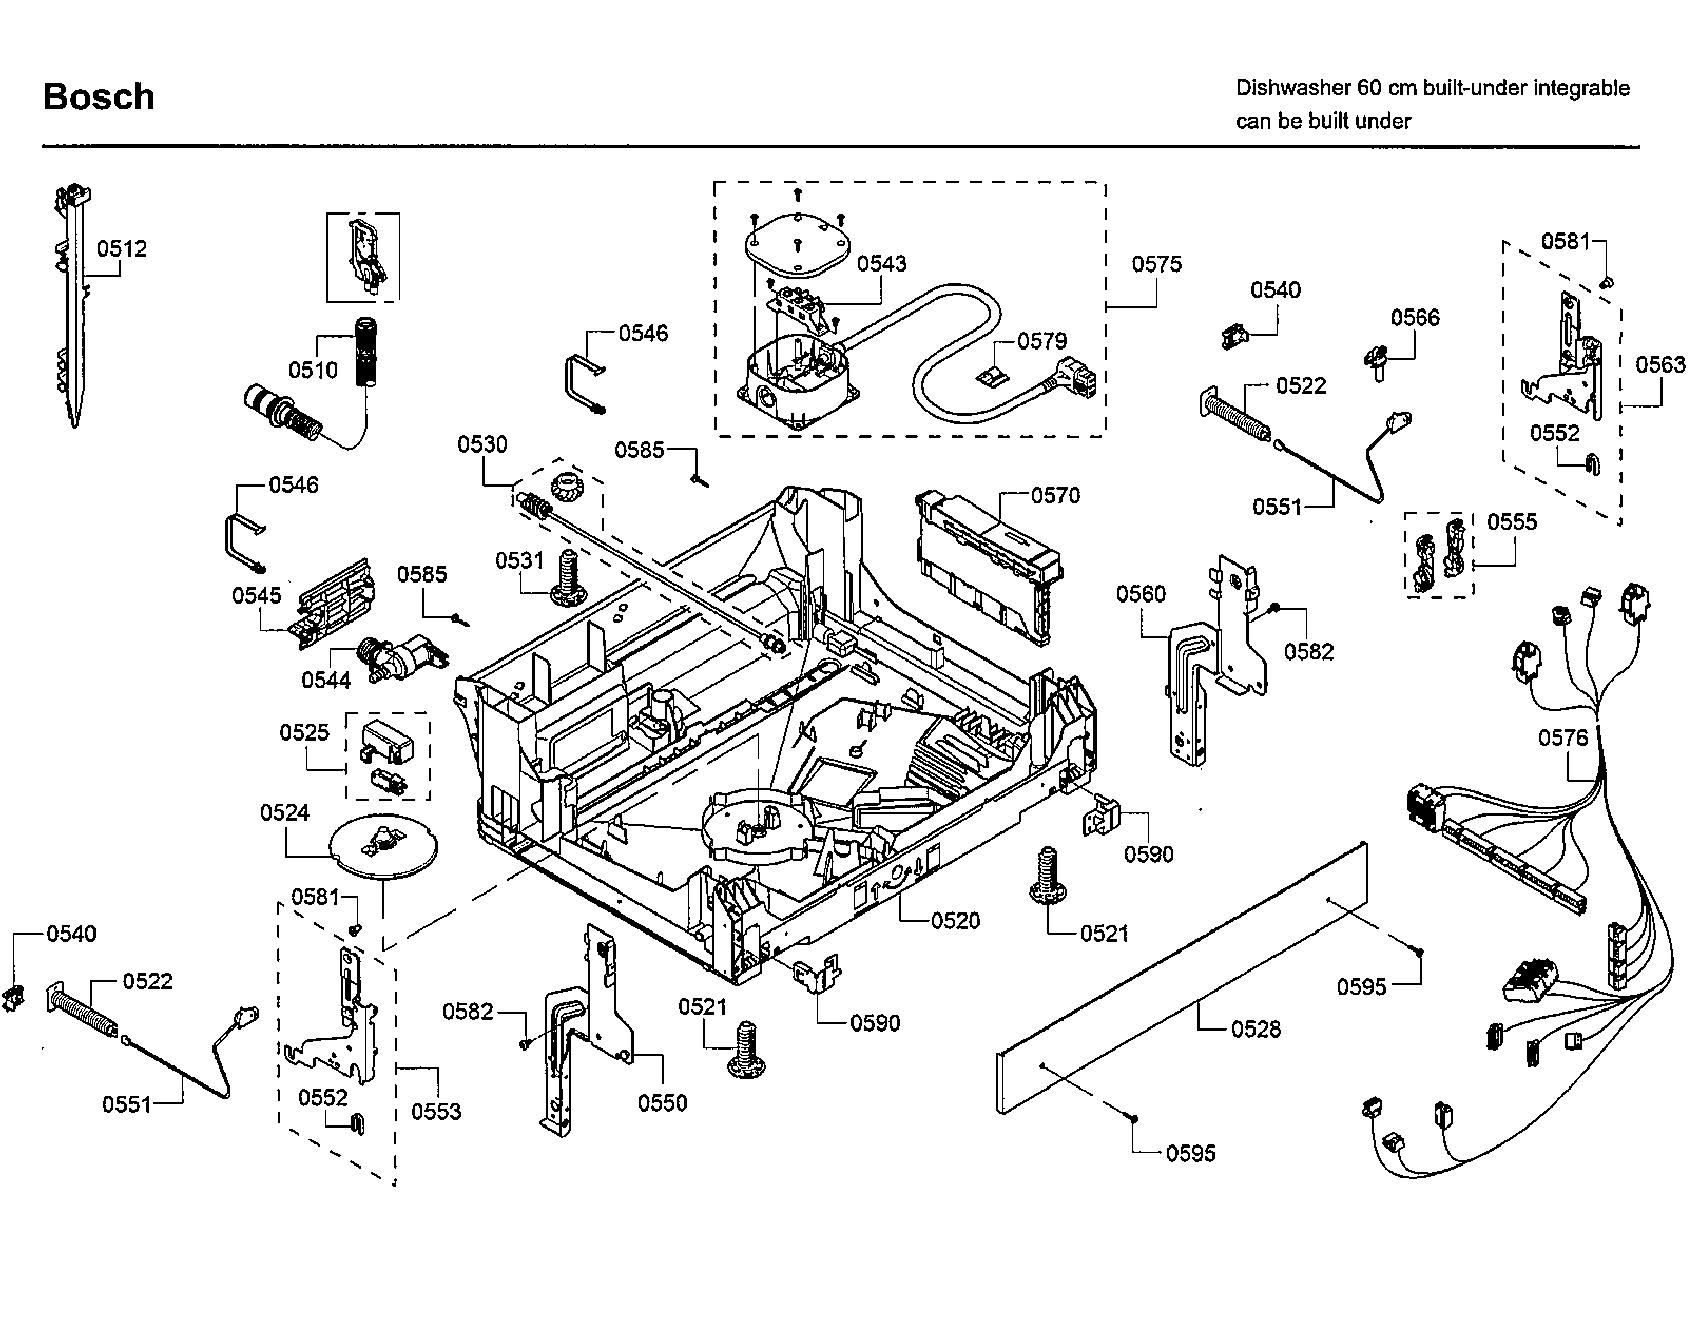 Bosch model SHXM78W55N/01 dishwasher genuine parts